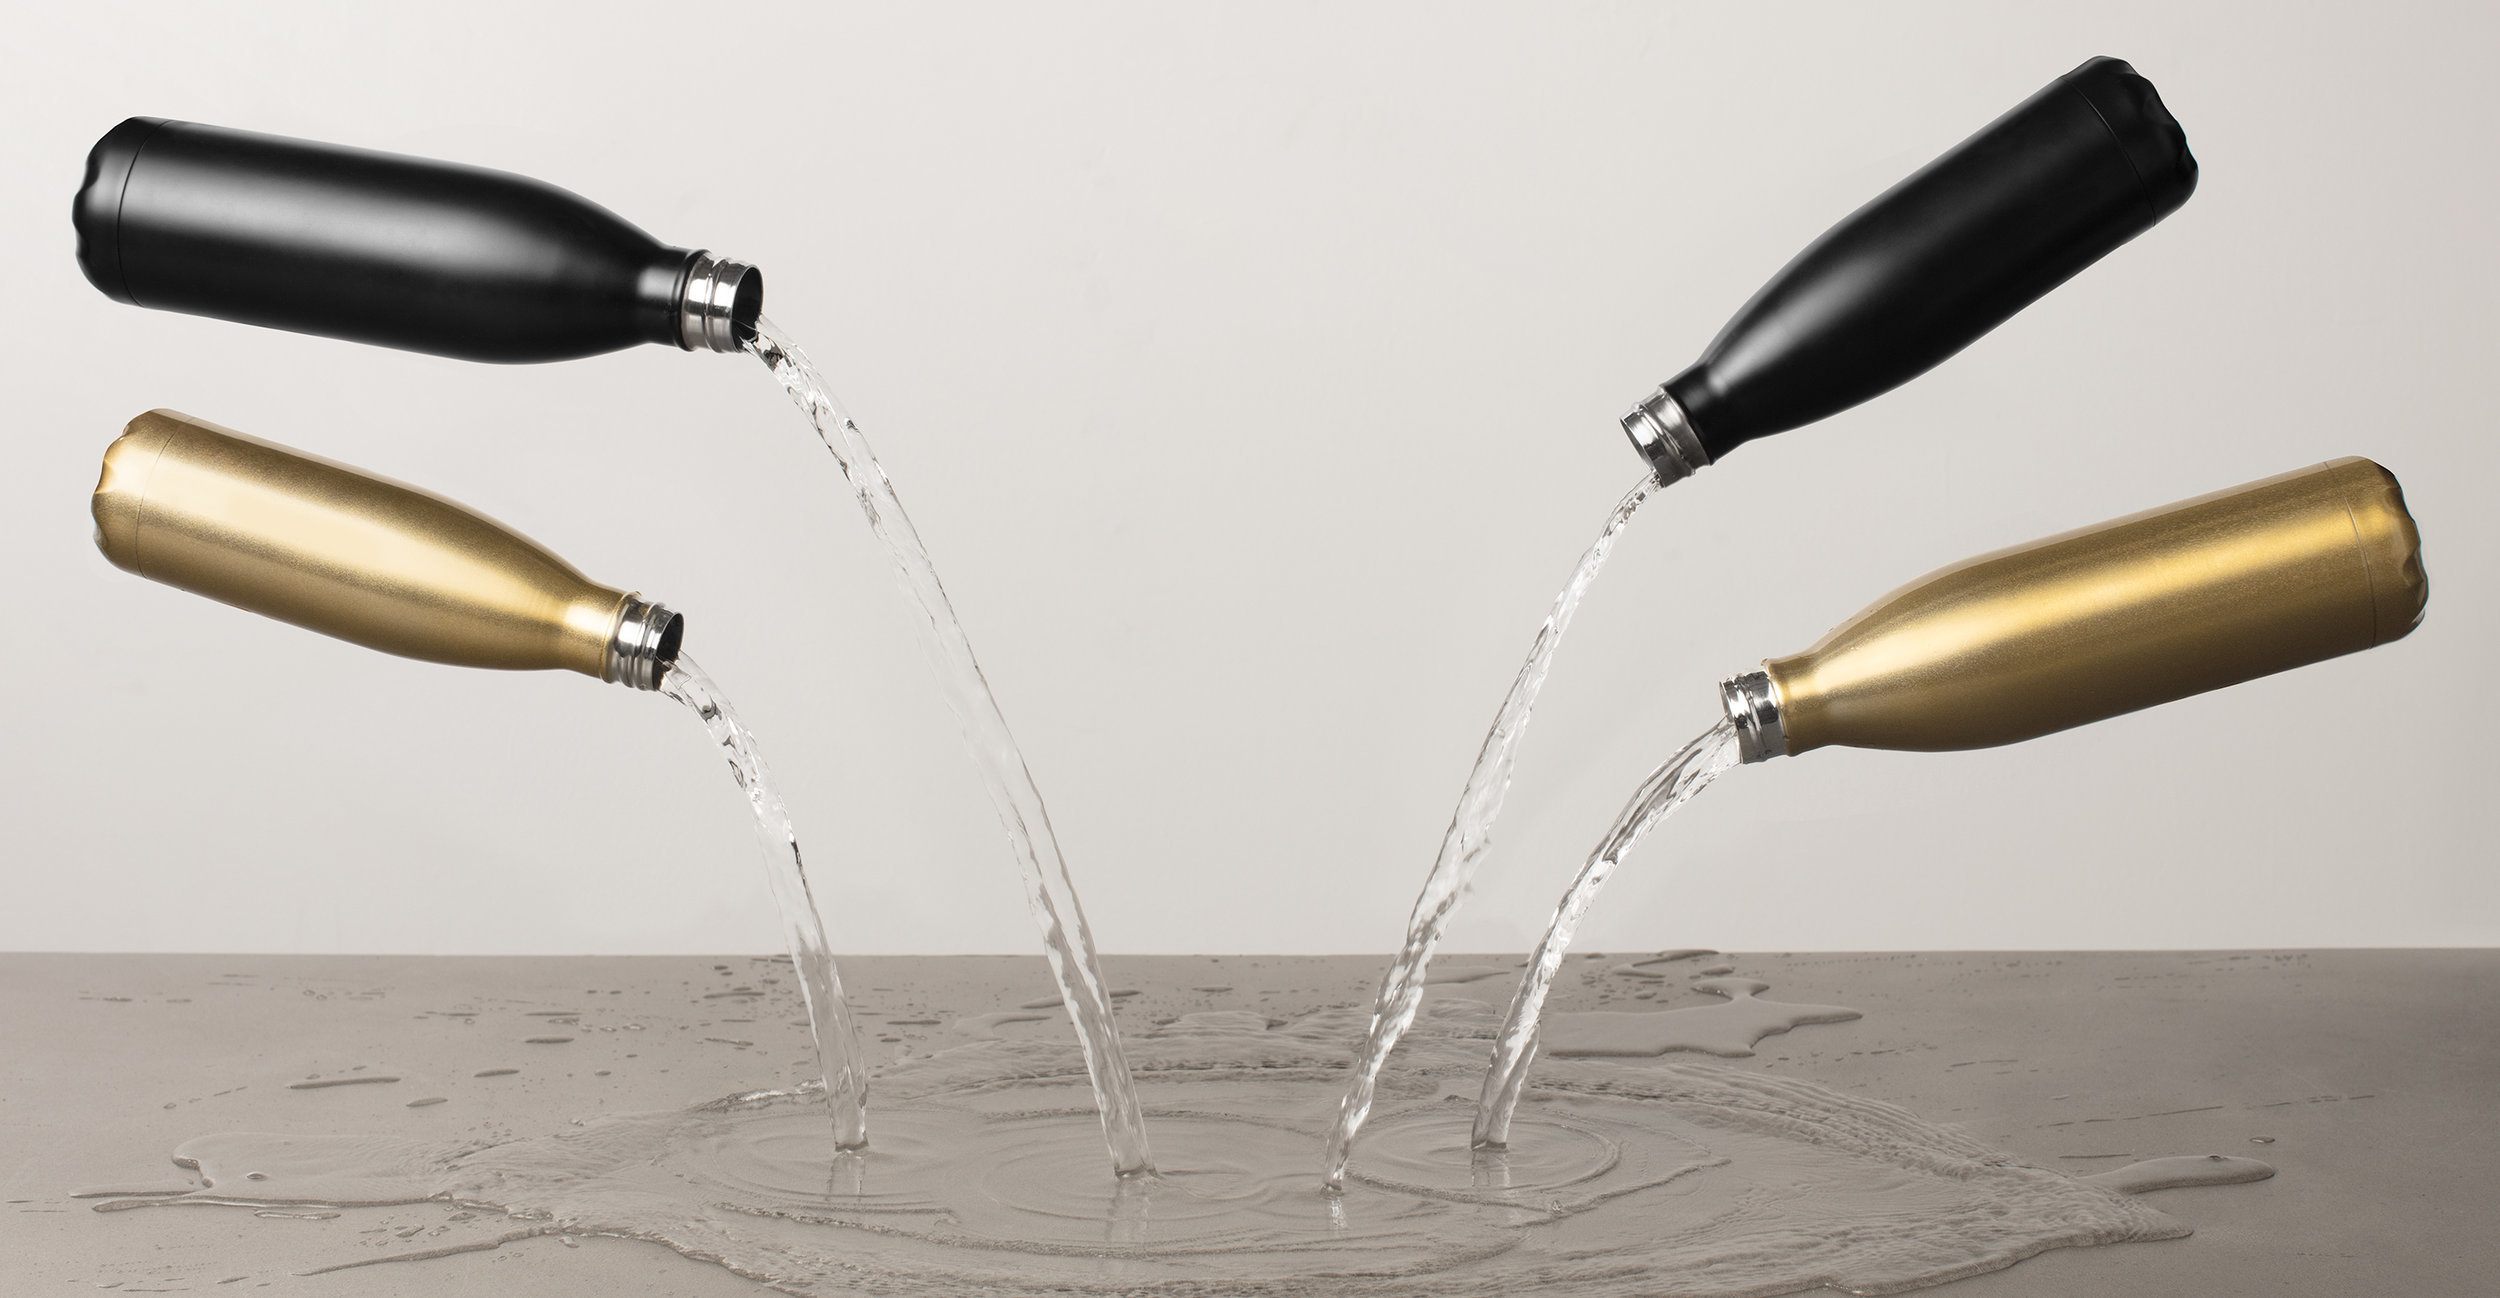 ACCLUT002GOL-UK_Lutvann_Water_Bottle_500ml_Metallic_Gold_LB05.jpg